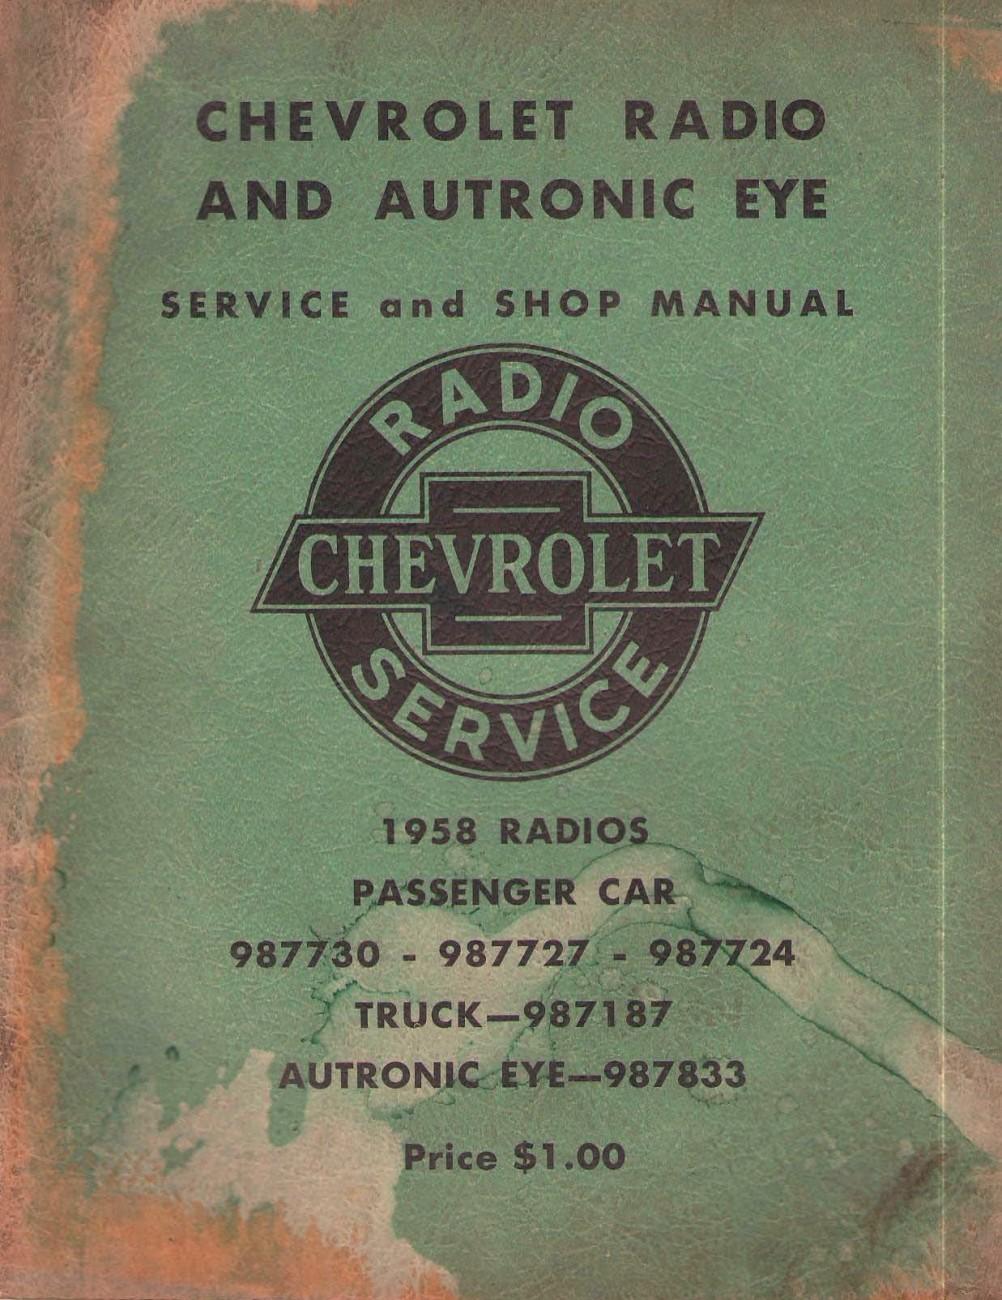 1958 chevrolet radio and autronic eye service and shop manualAutronic Eye Circuit Diagram Of 1958 Chevrolet #15